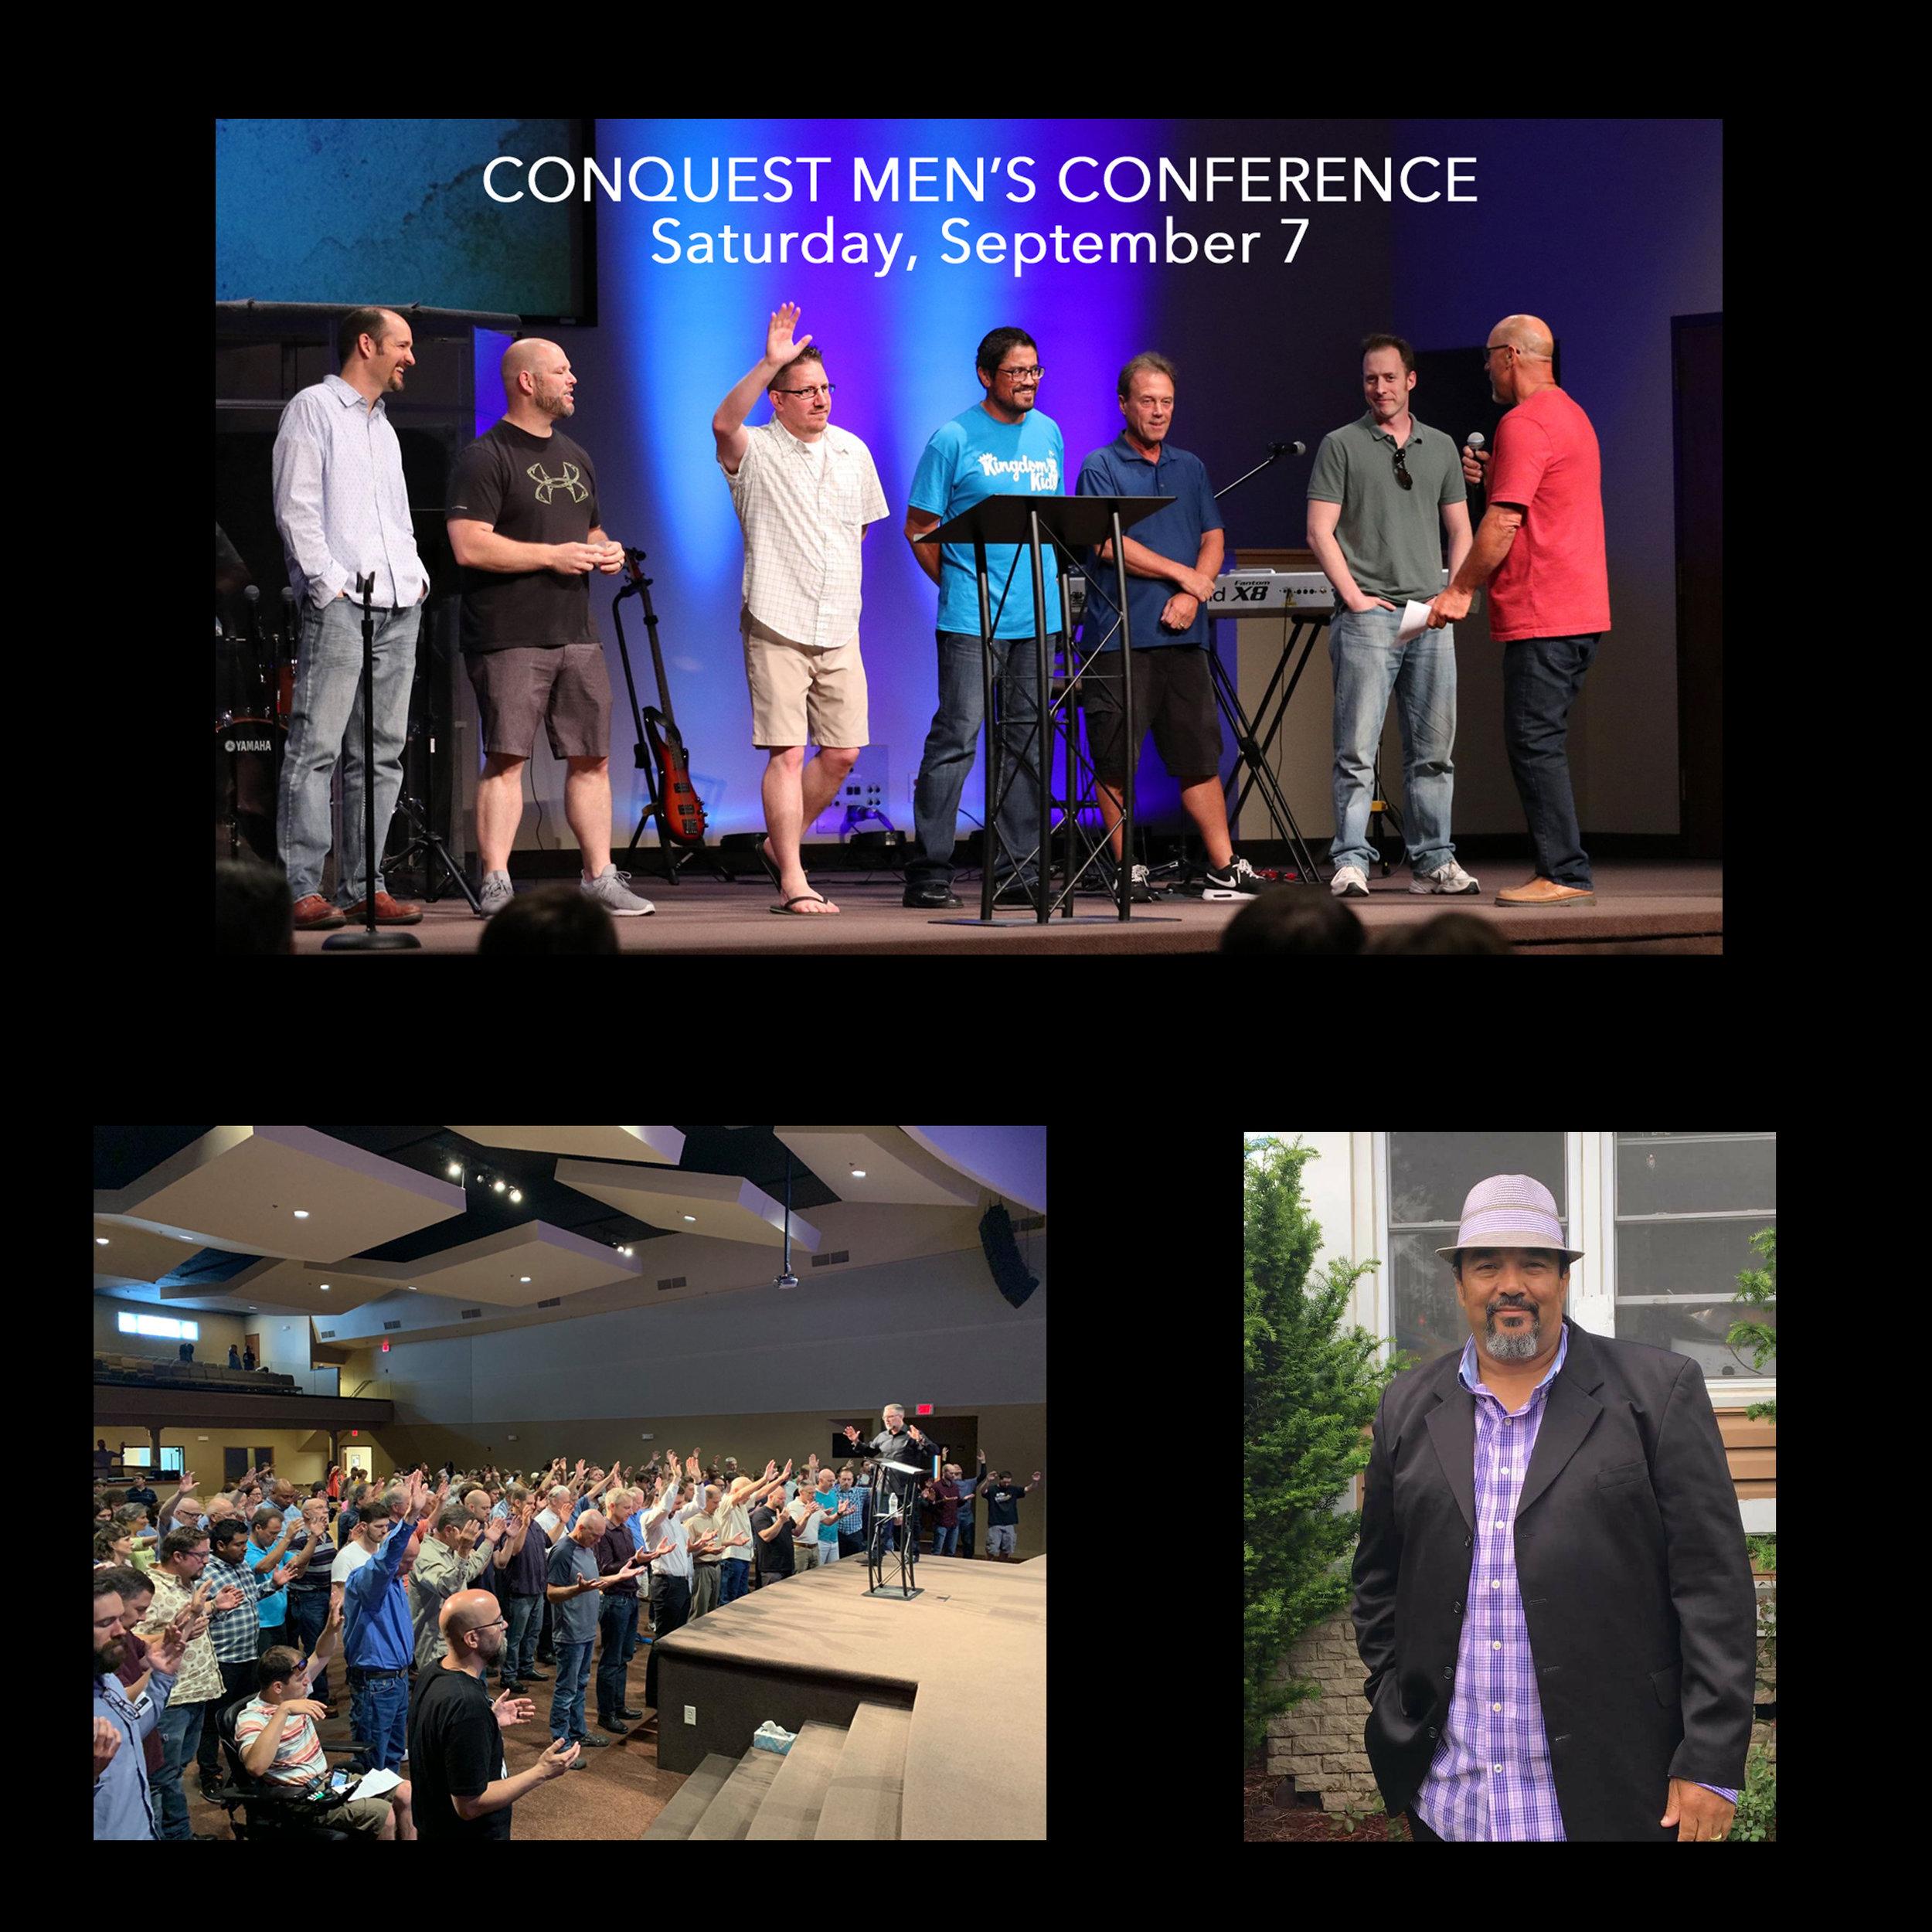 mens-conference.jpg